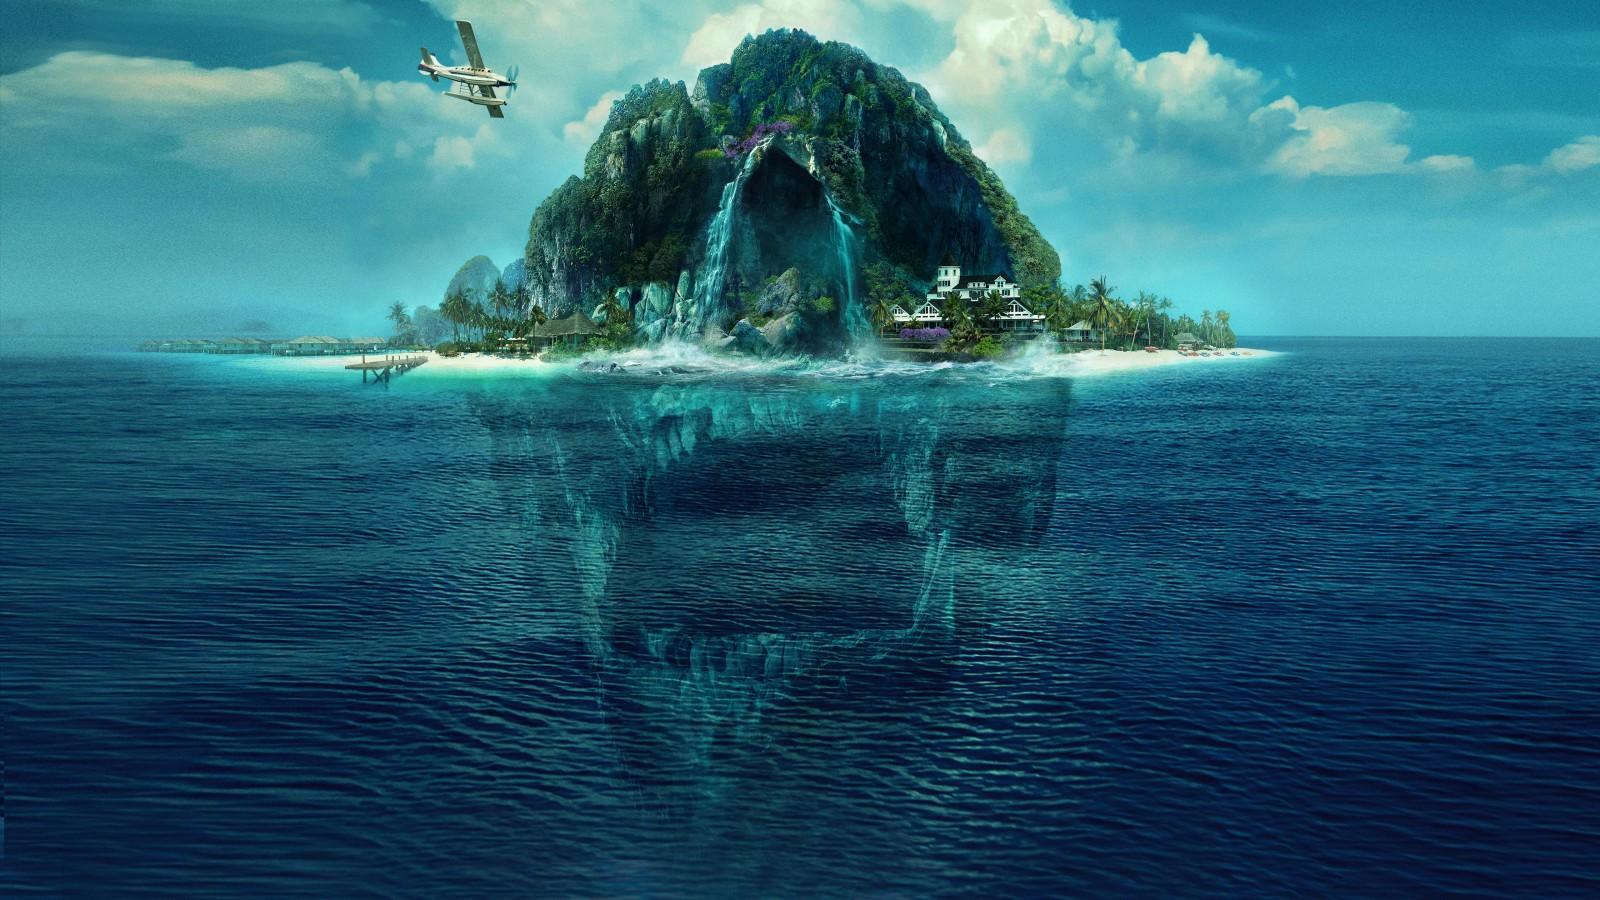 Fantasy Island 2020 4K 5K HD desktop wallpaper Widescreen High 1600x900